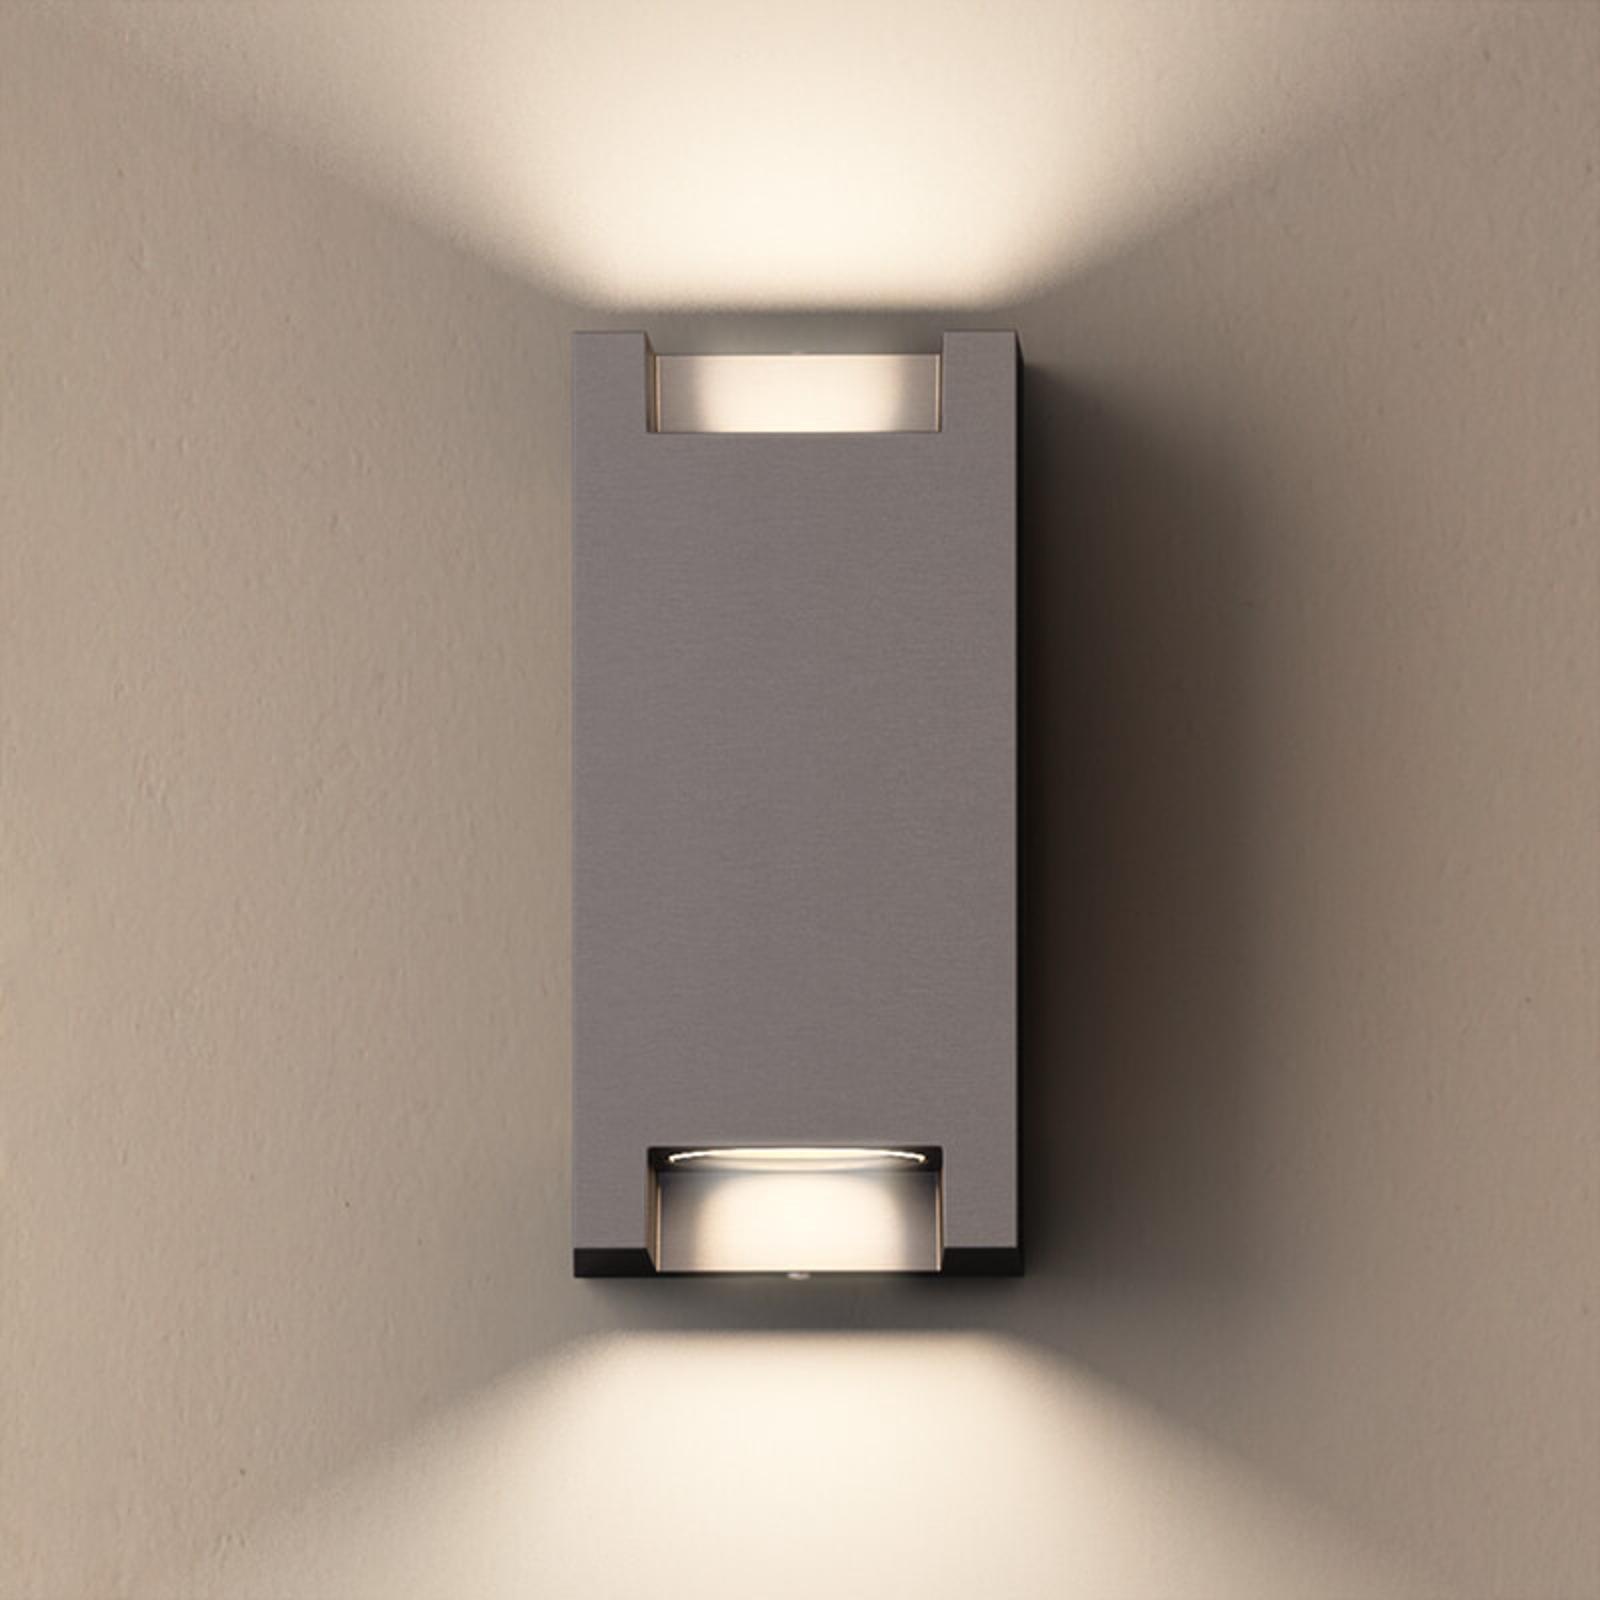 Philips myGarden Trowel Außenwandlampe